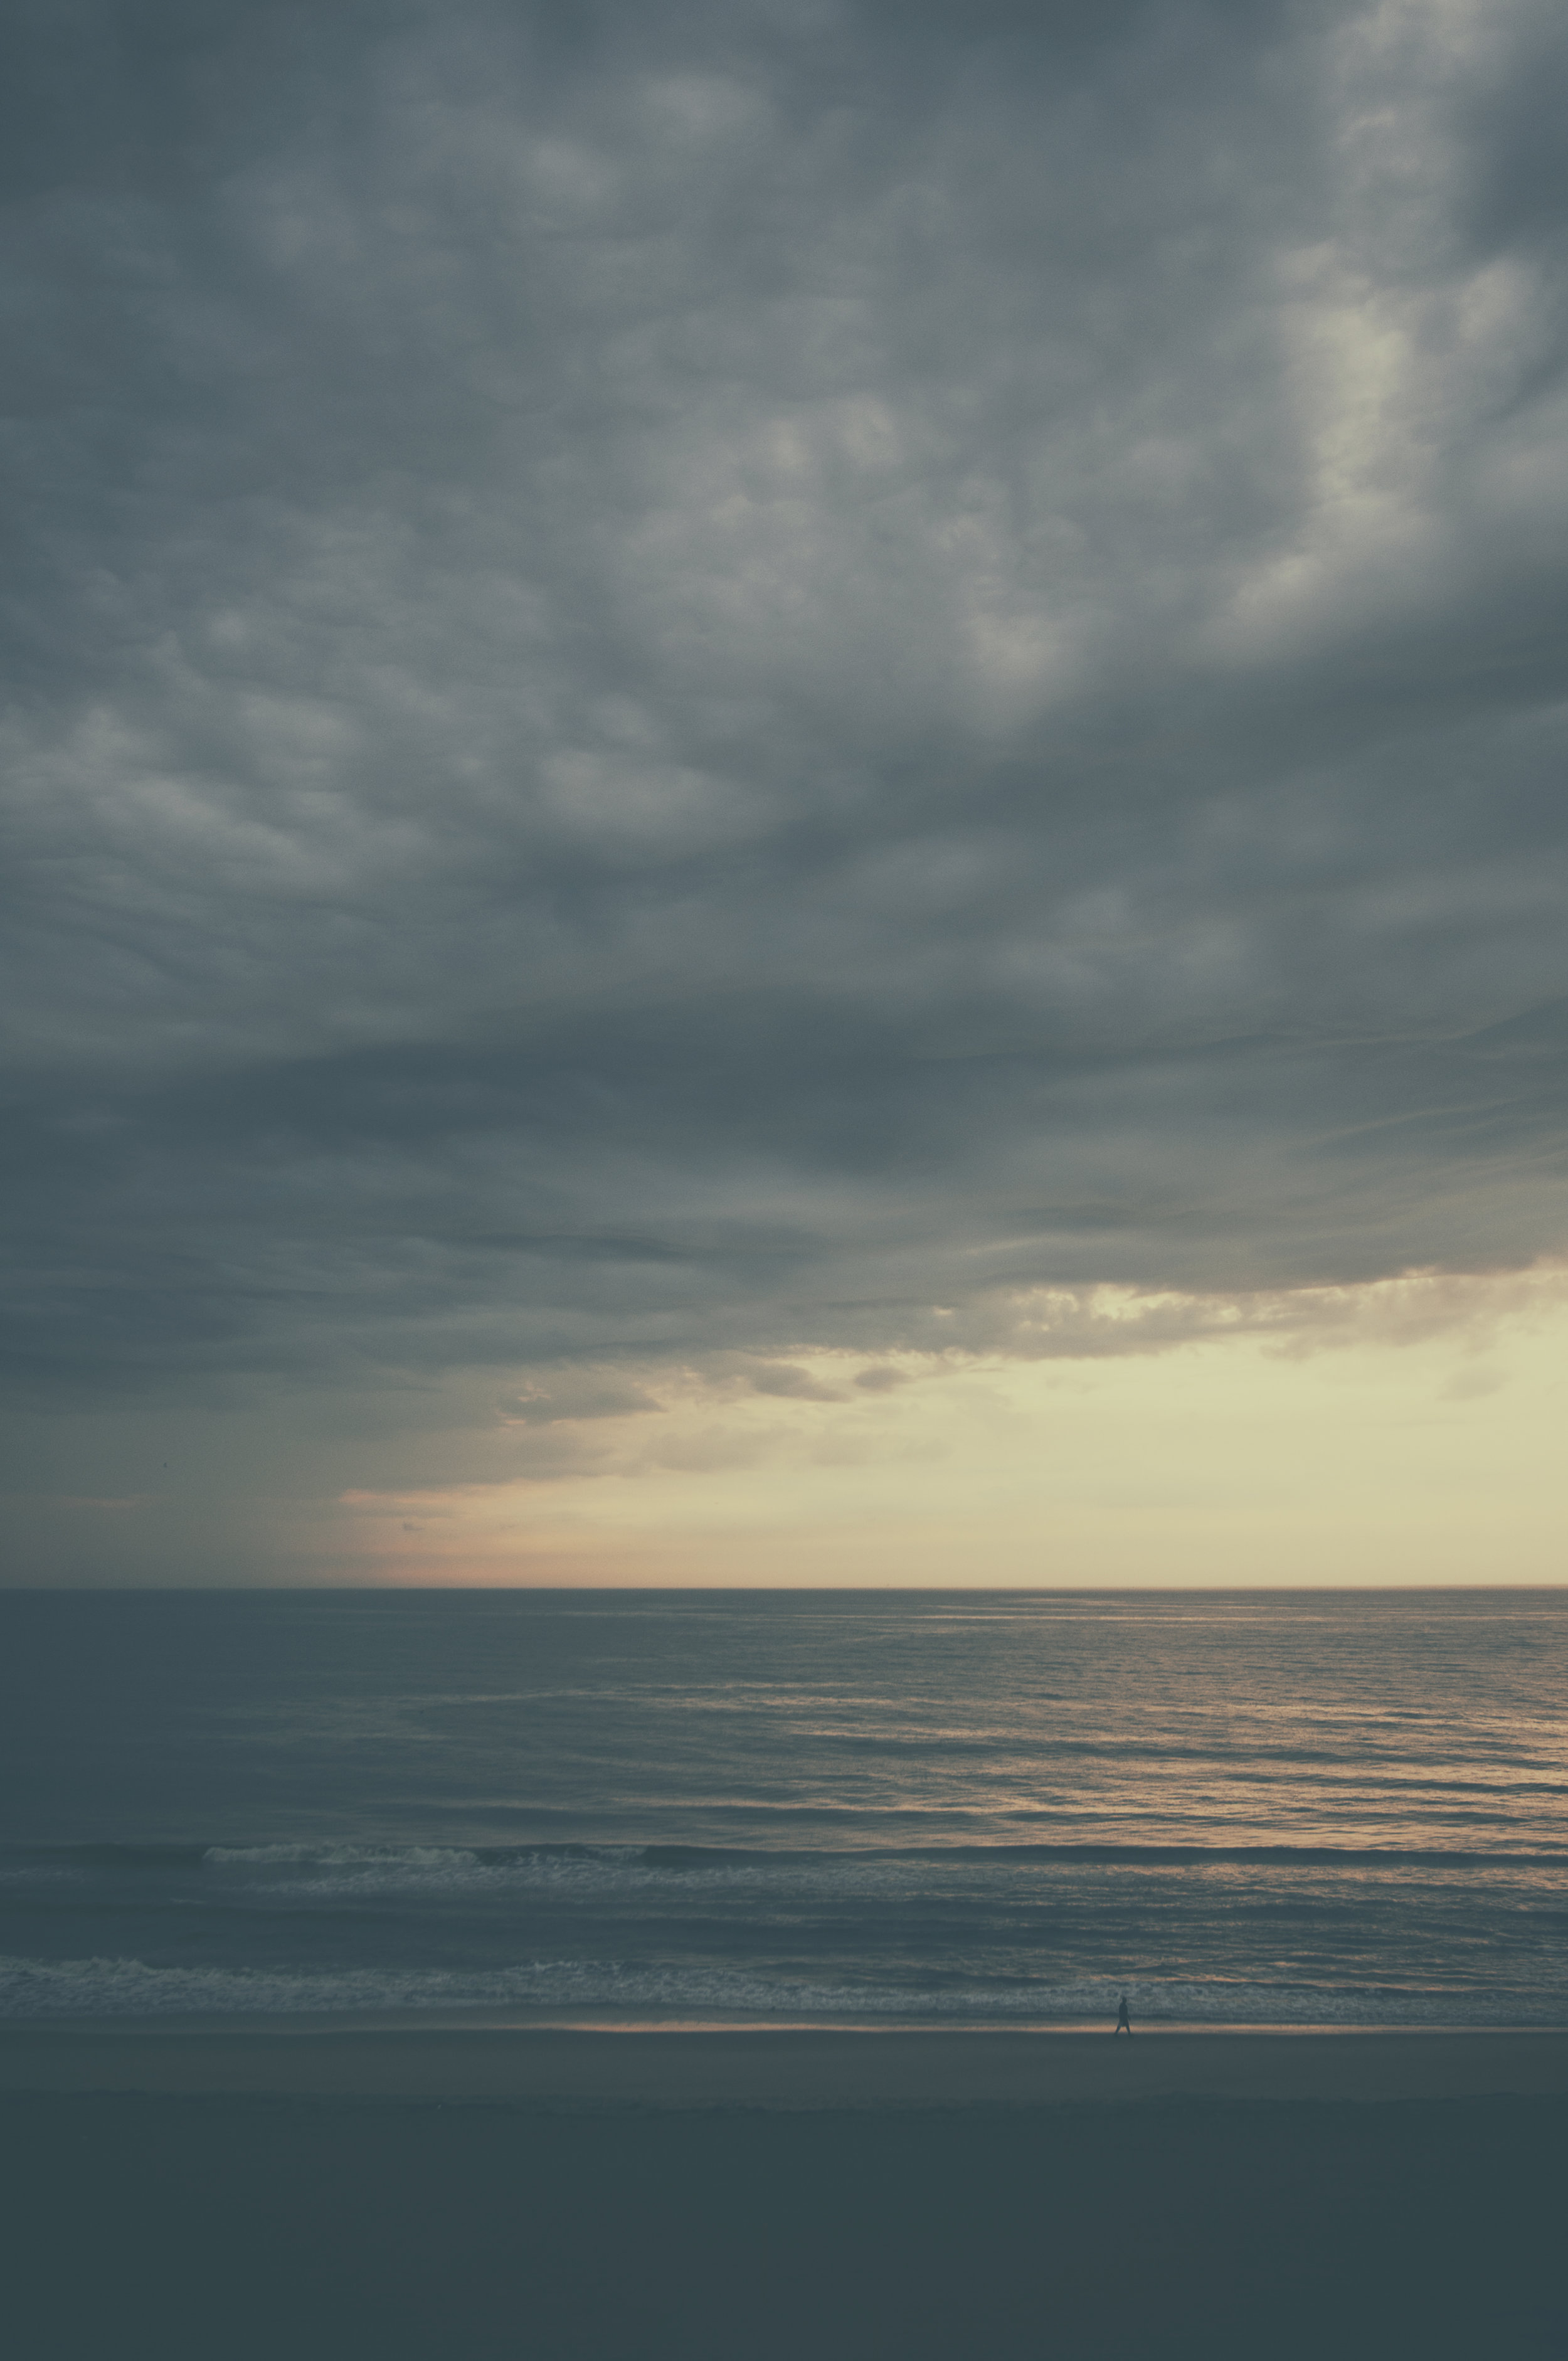 Landscape_Beach002.jpg